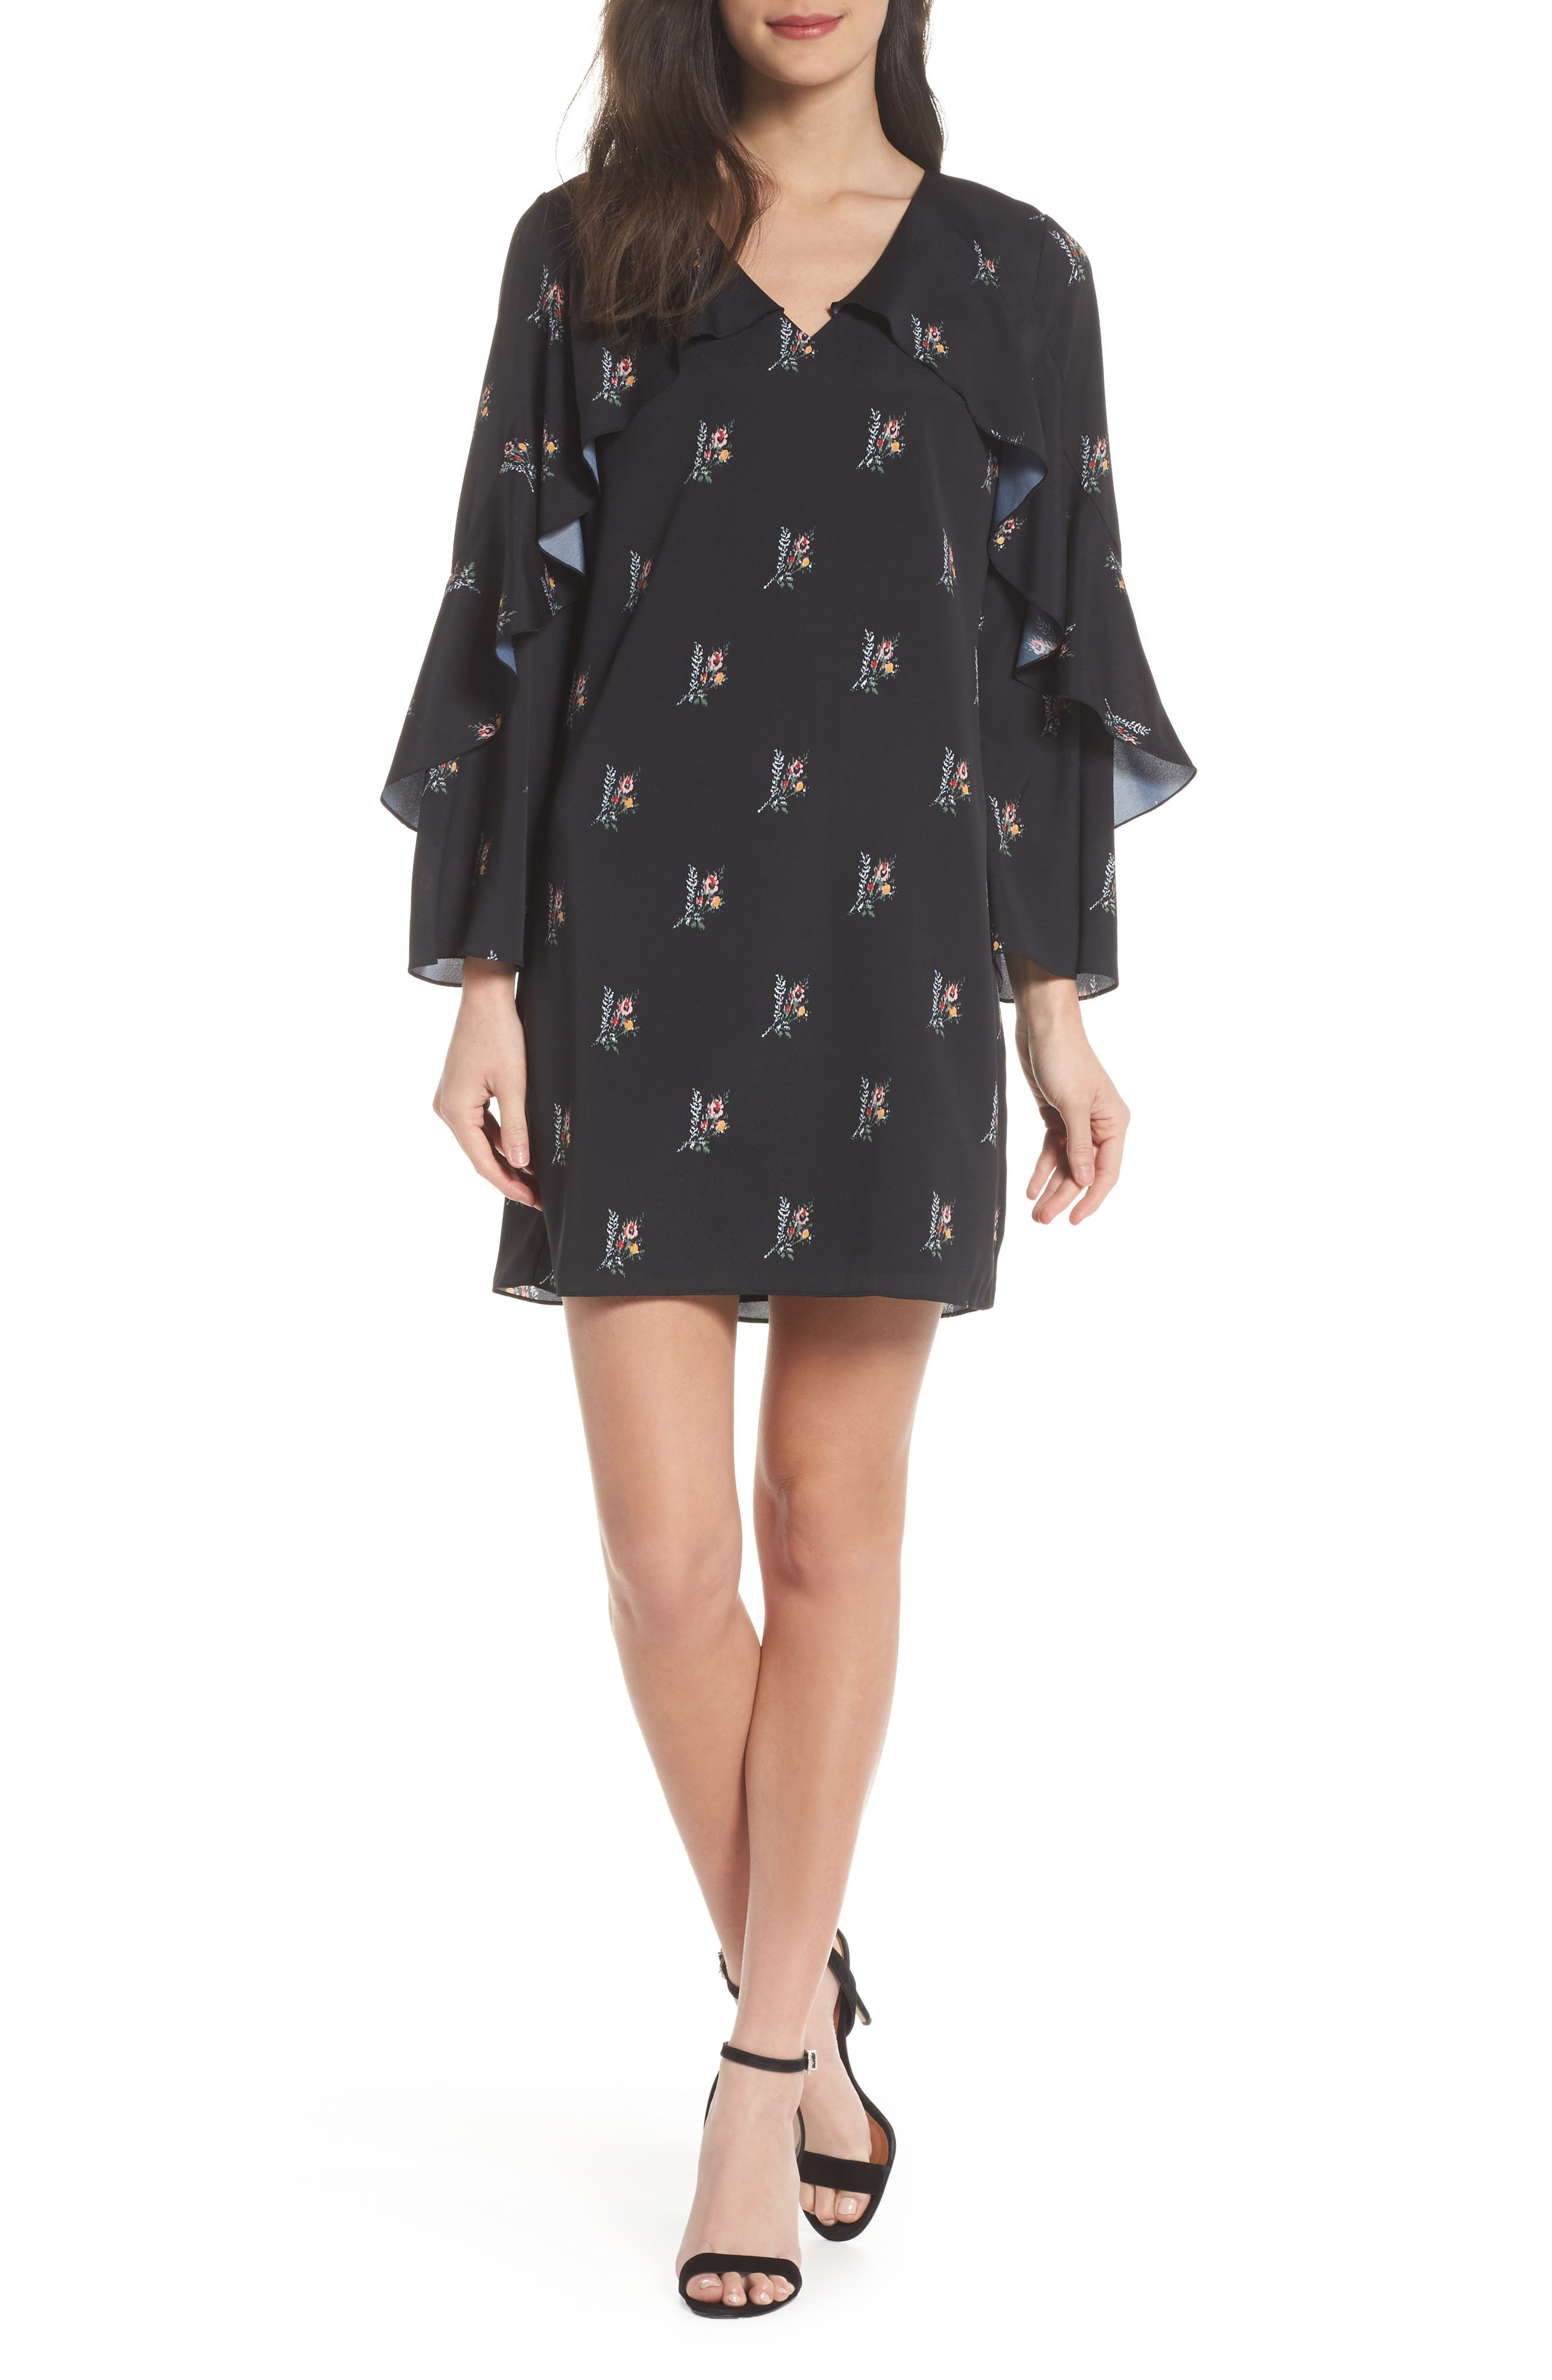 Olessia Ruffle Shift Dress,                         Main,                         color, Black Multi